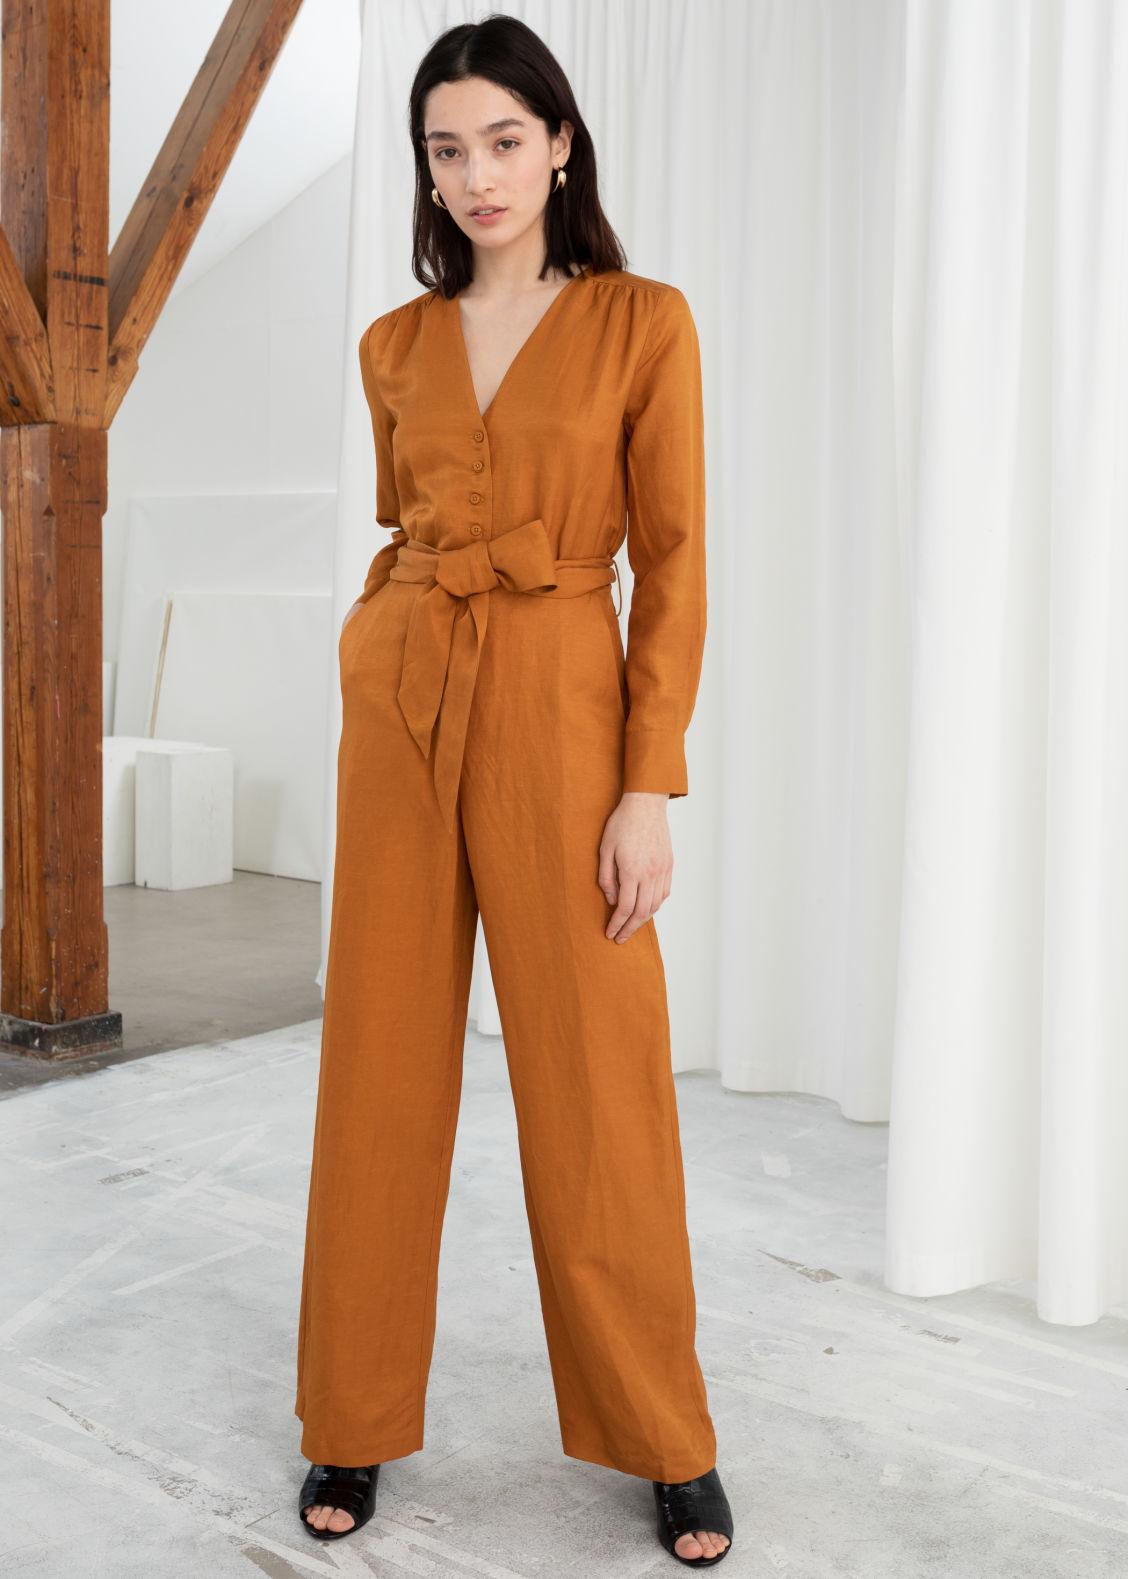 53c15fa711 Belted Linen Blend Jumpsuit - Tan - Jumpsuits   Playsuits -   Other ...